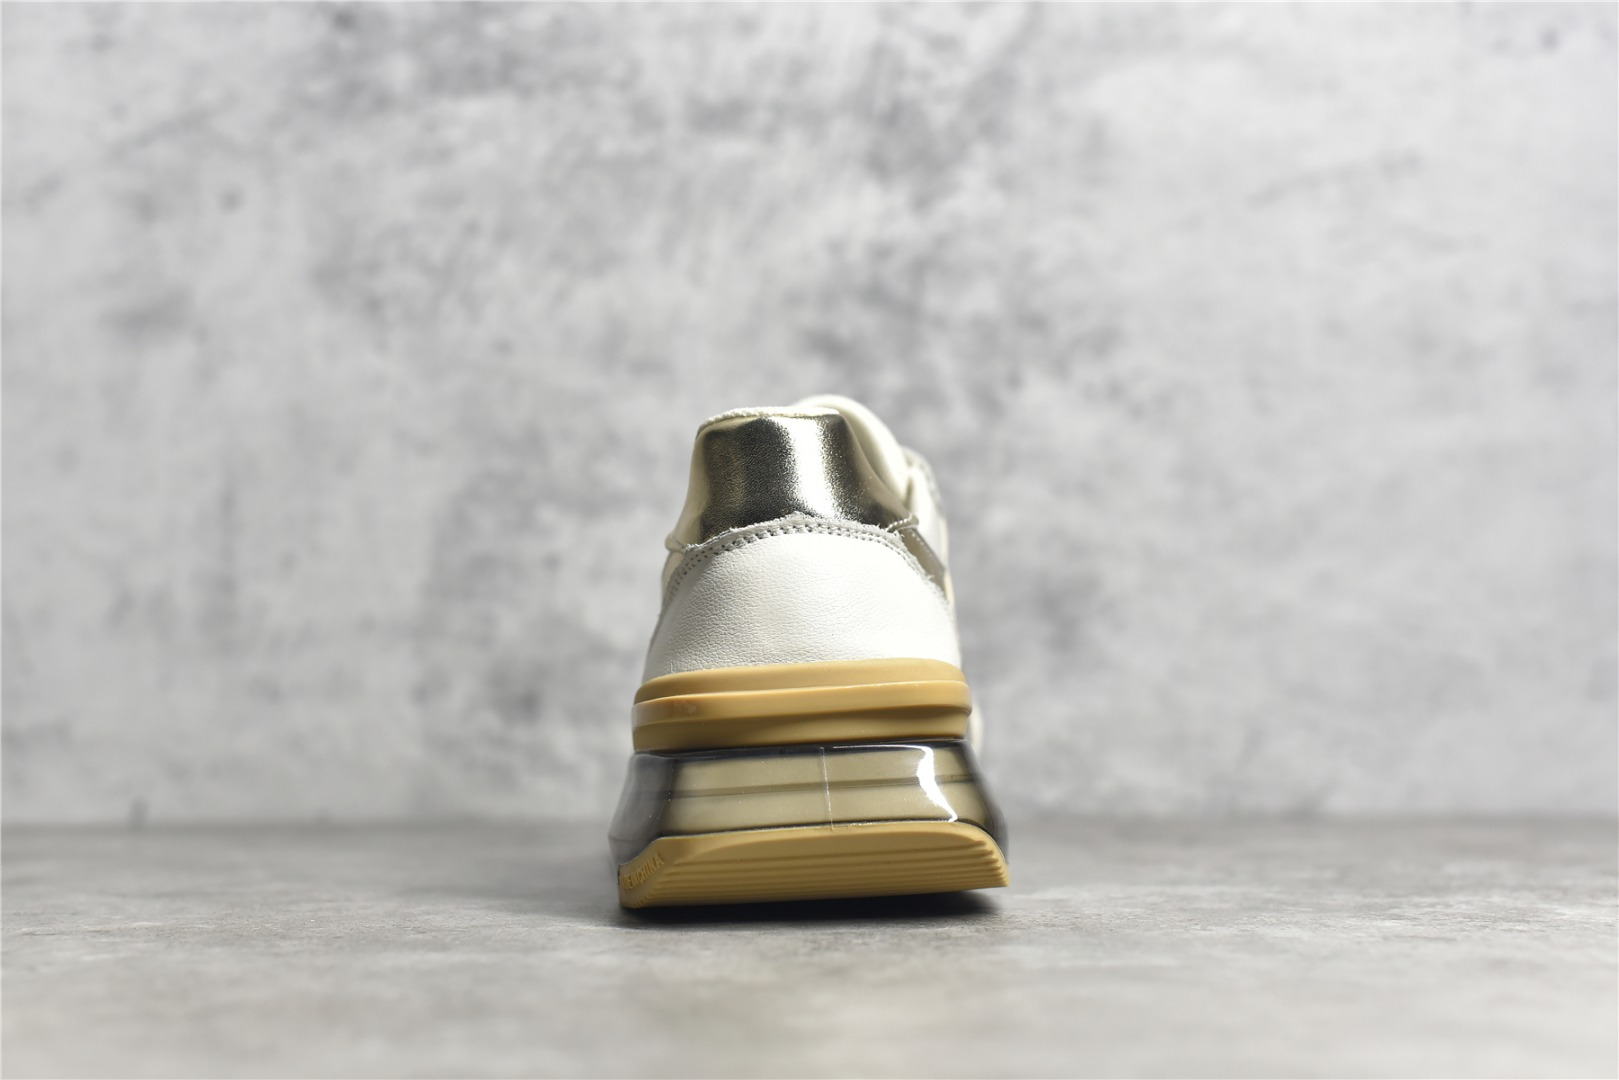 ECCO爱步长辈跑鞋 莆田爱步工厂货源 ECCO爱步2021春夏新款 健步系列运动鞋休闲潮鞋跑步鞋-潮流者之家